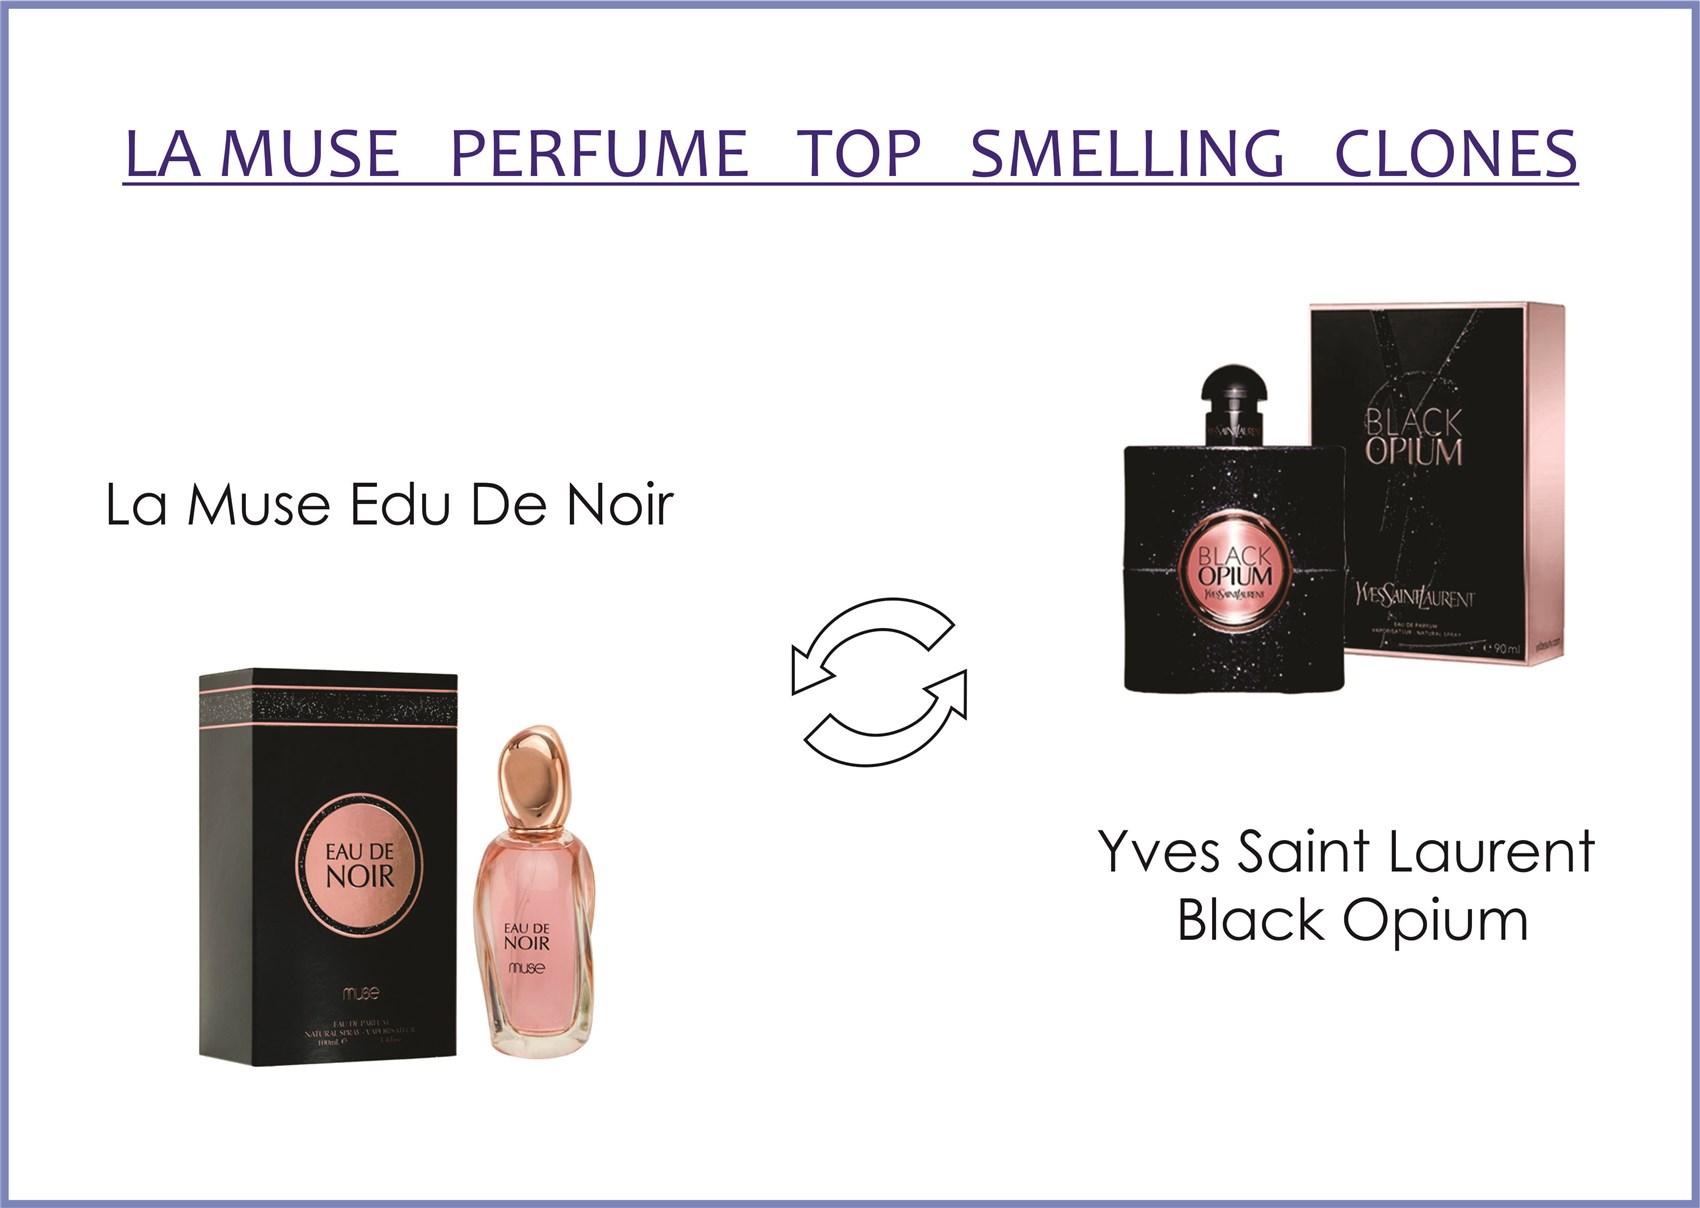 la-muse-eau-de-noir-for-women-100-ml-edp-by-lattafa-perfumes-yves-saint-laurent-black-opium-perfume-for-women-90-ml-edp